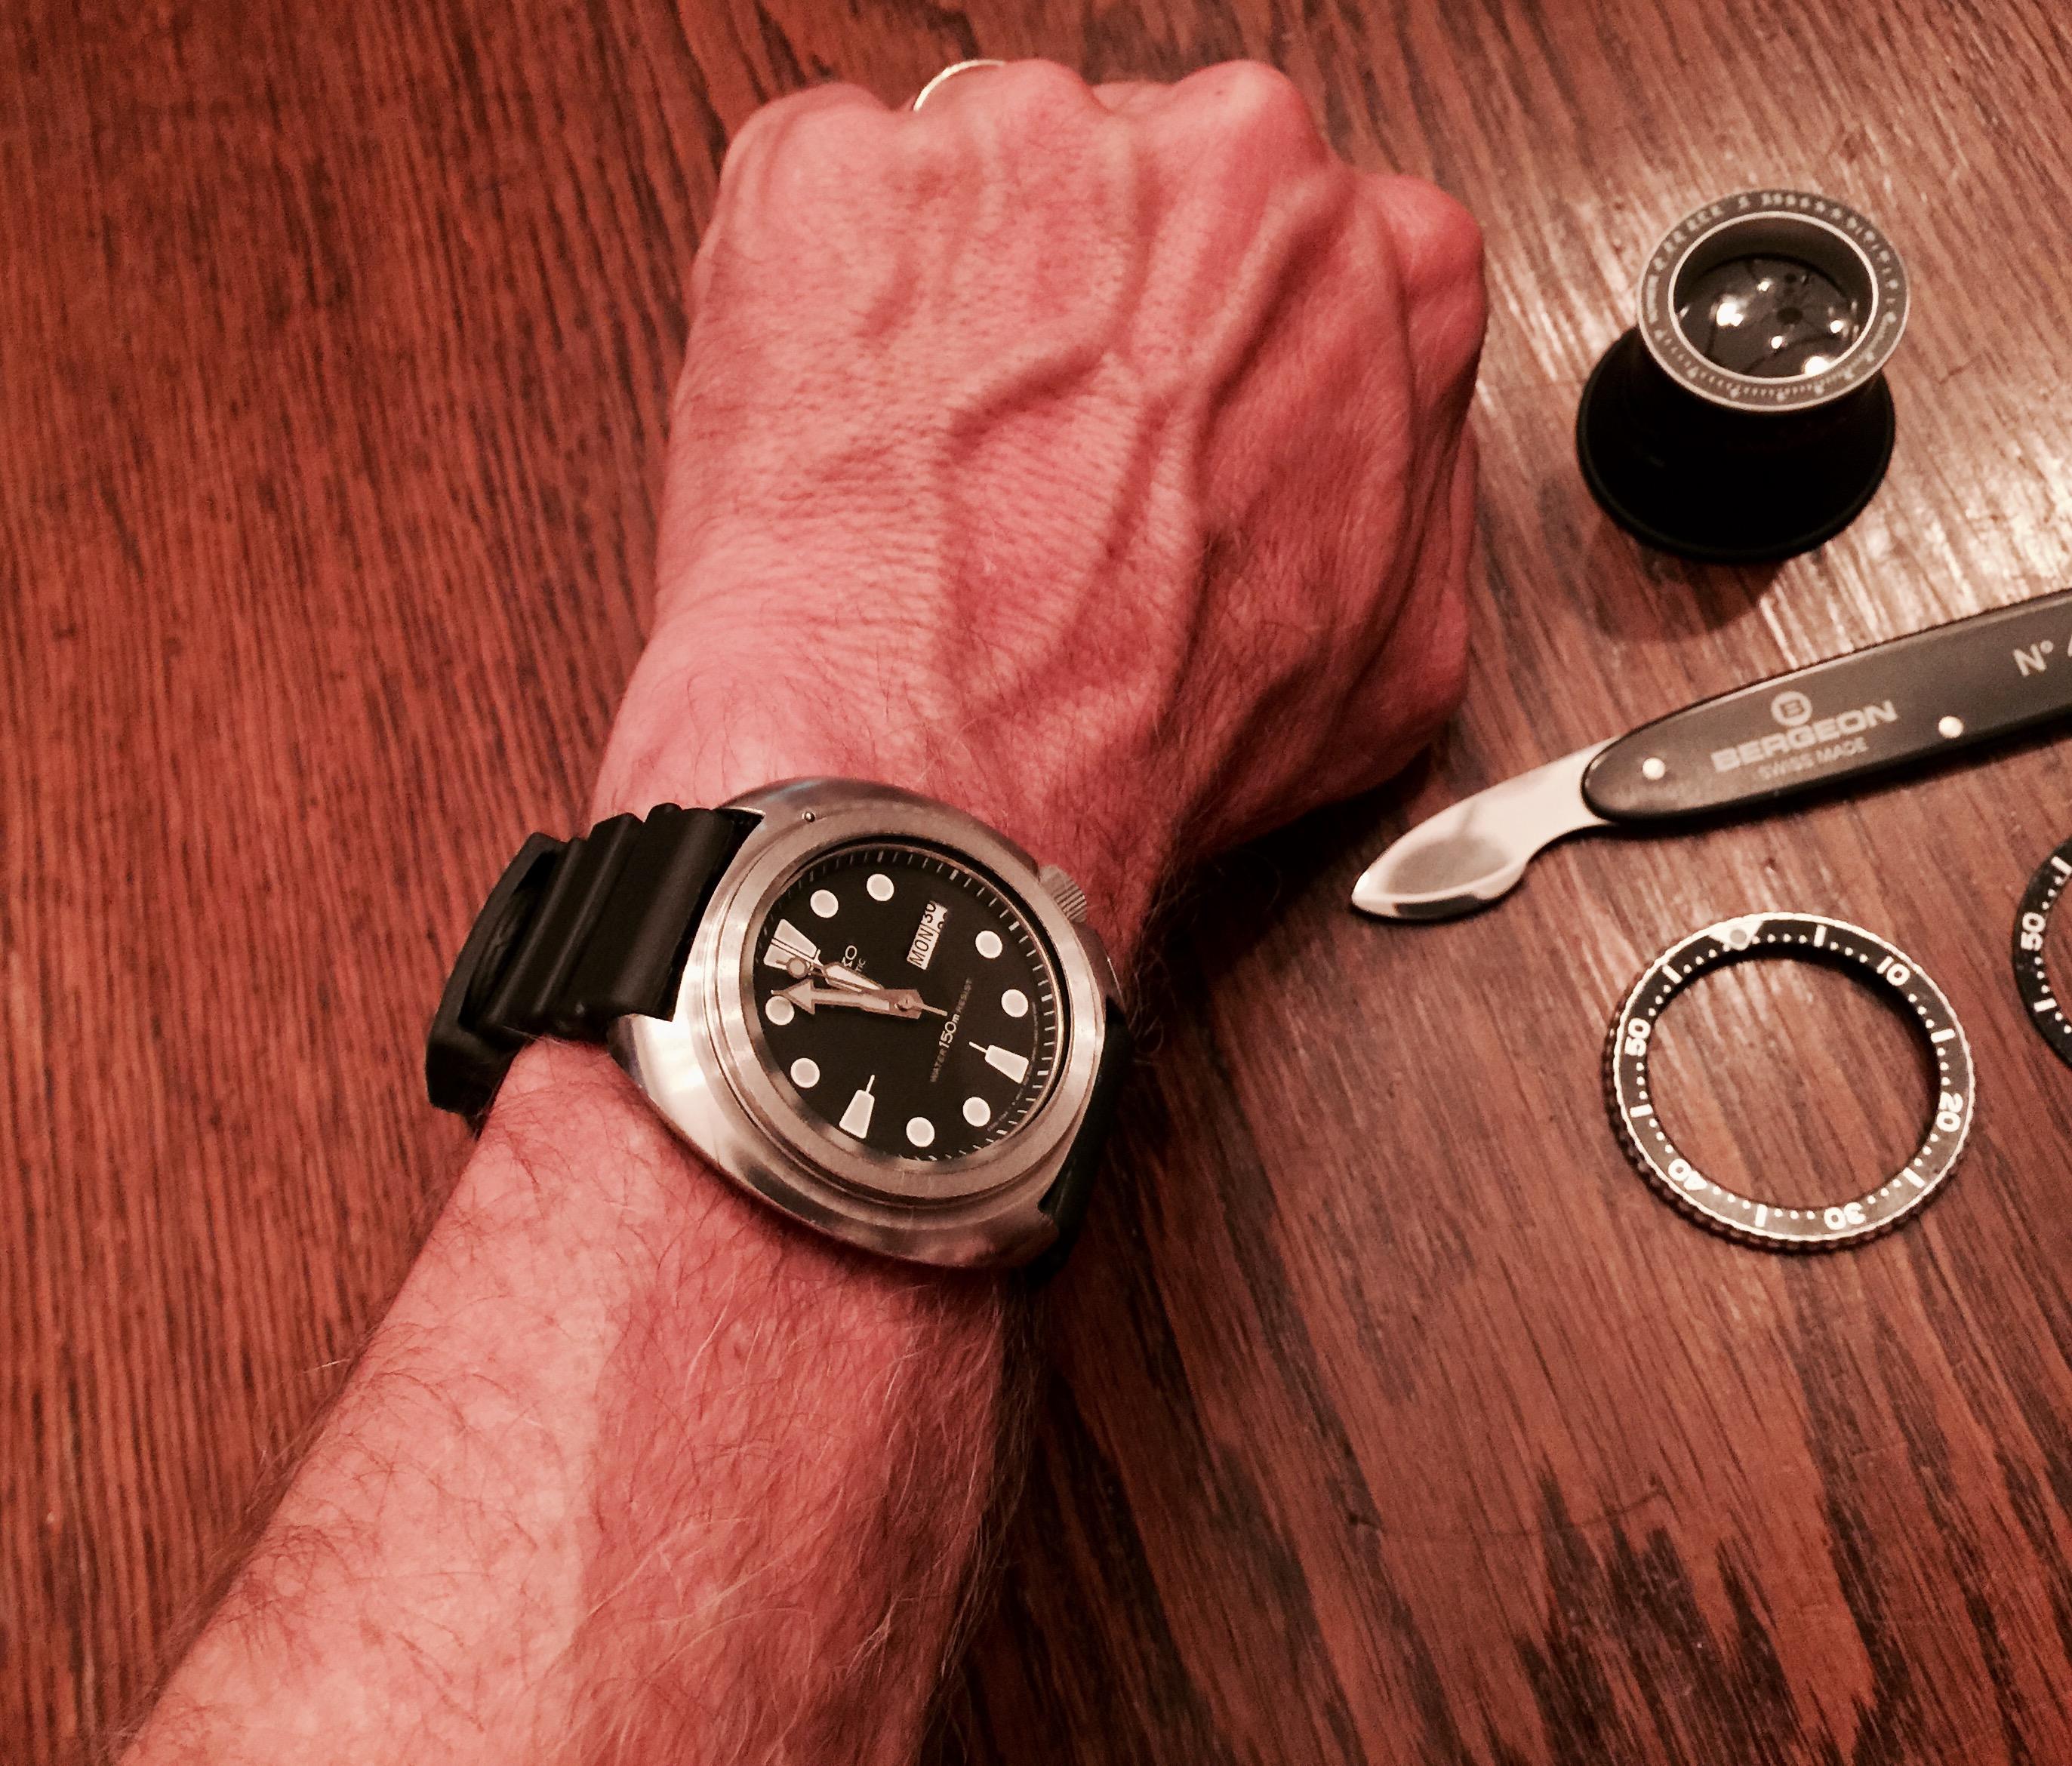 Question regarding how to remove a Seiko diver bezel and